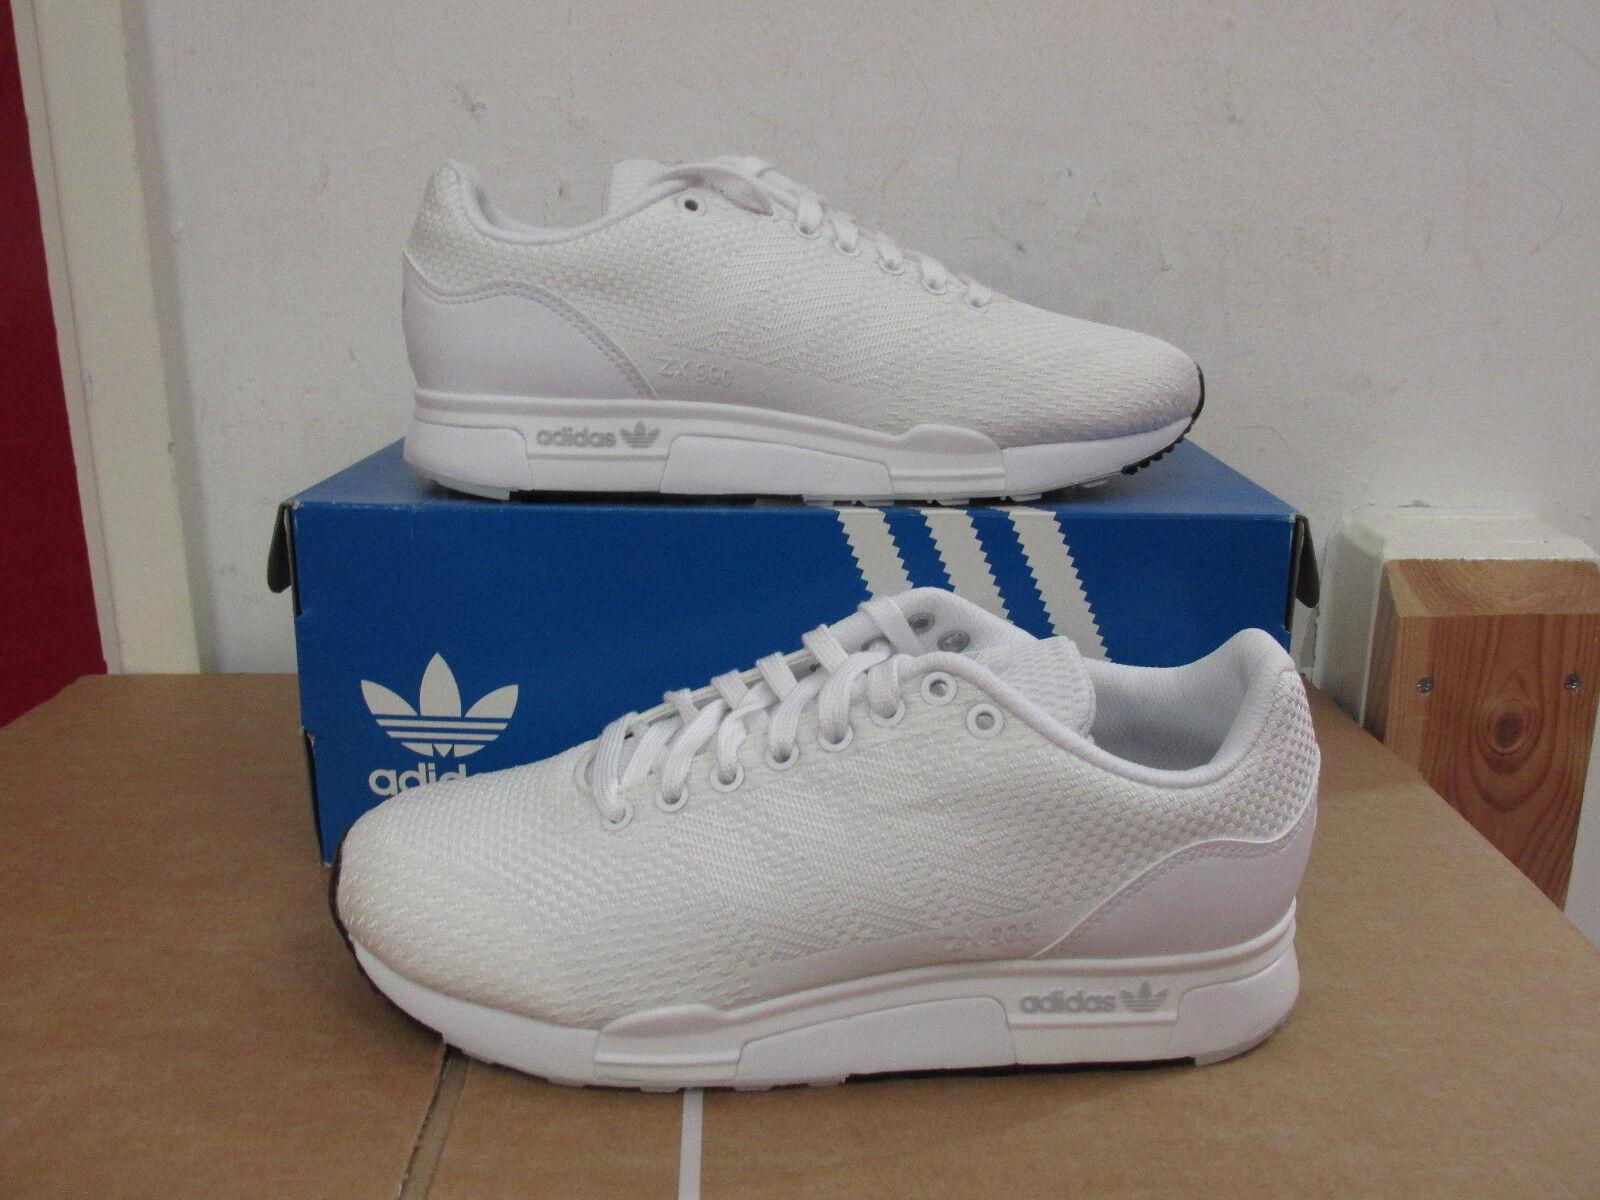 Adidas Originali Zx 900 Weave W Donna M20375 M20375 M20375 Scarpe da Ginnastica Svendita | Qualità primaria  | Scolaro/Signora Scarpa  651f70